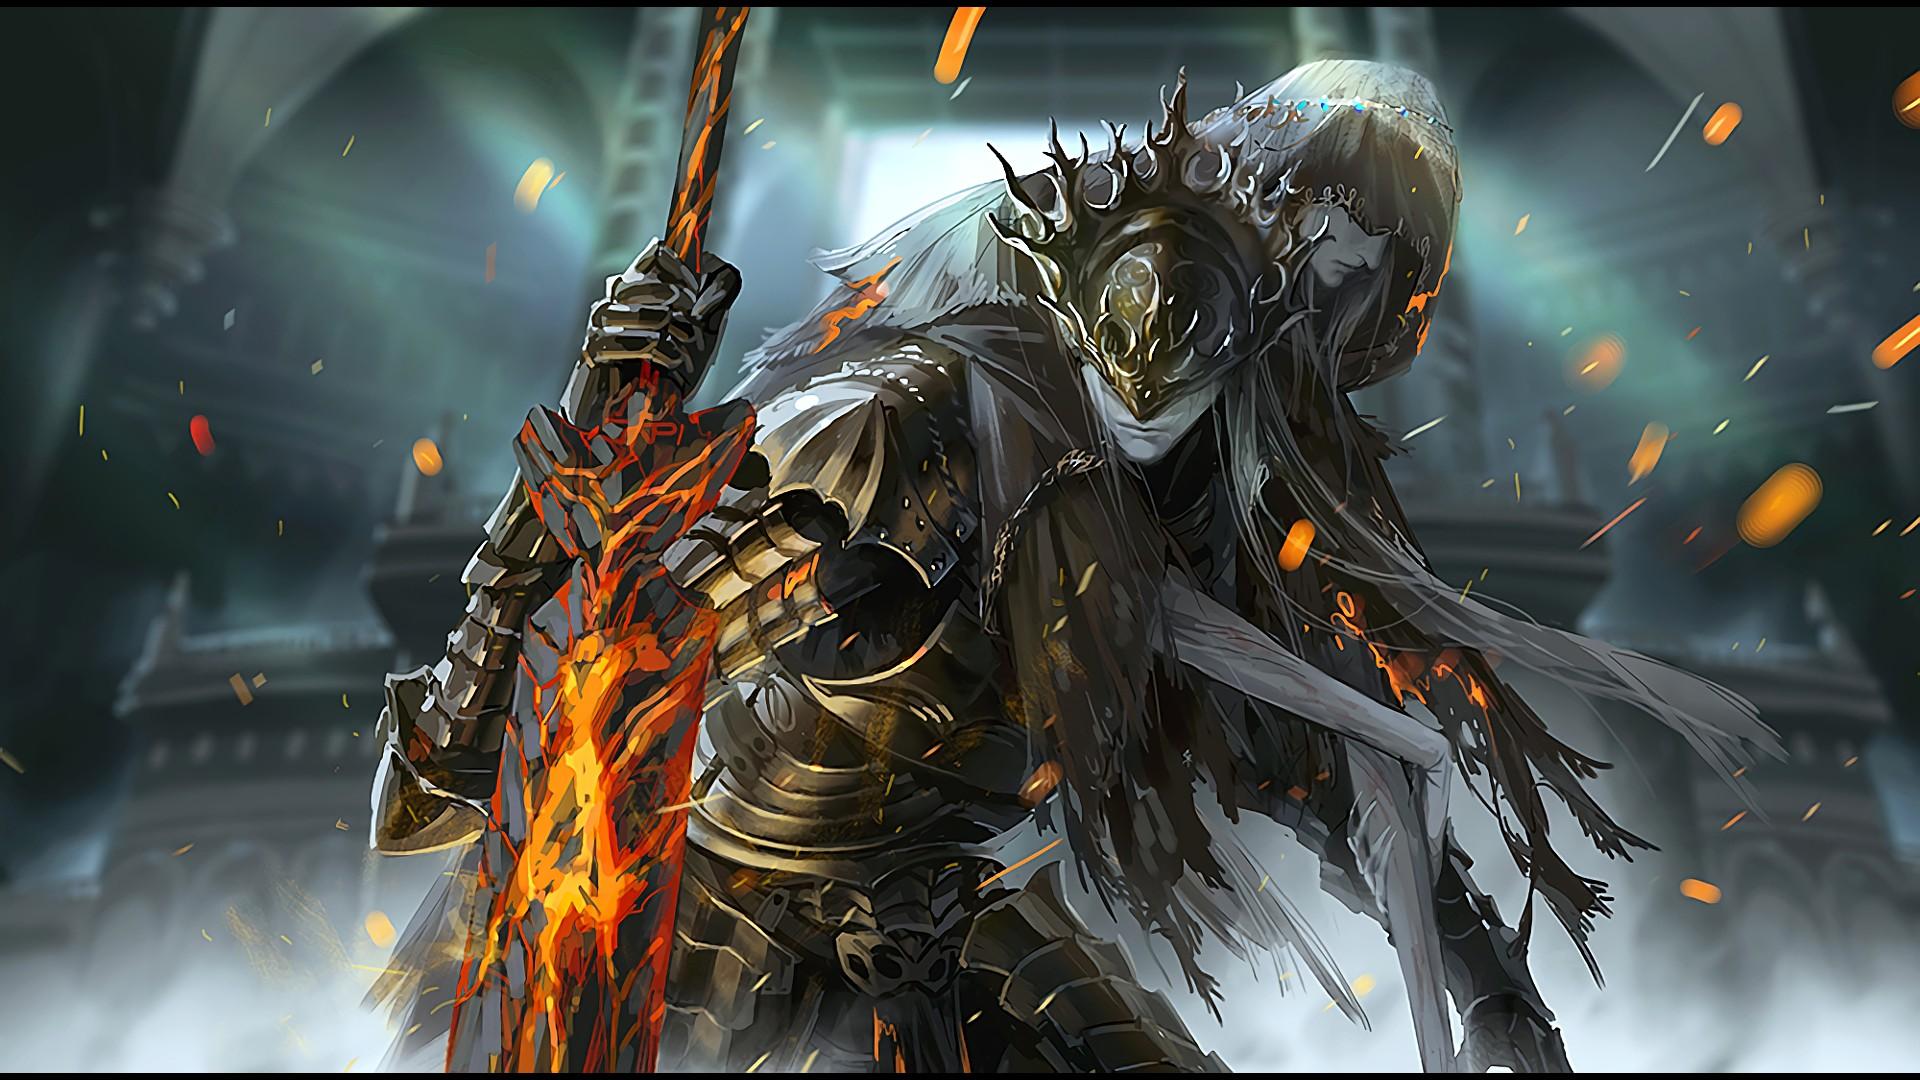 Dark Souls 3 4k Wallpaper: Dark Souls 3 Wallpaper 1920x1080 ·① Download Free Awesome